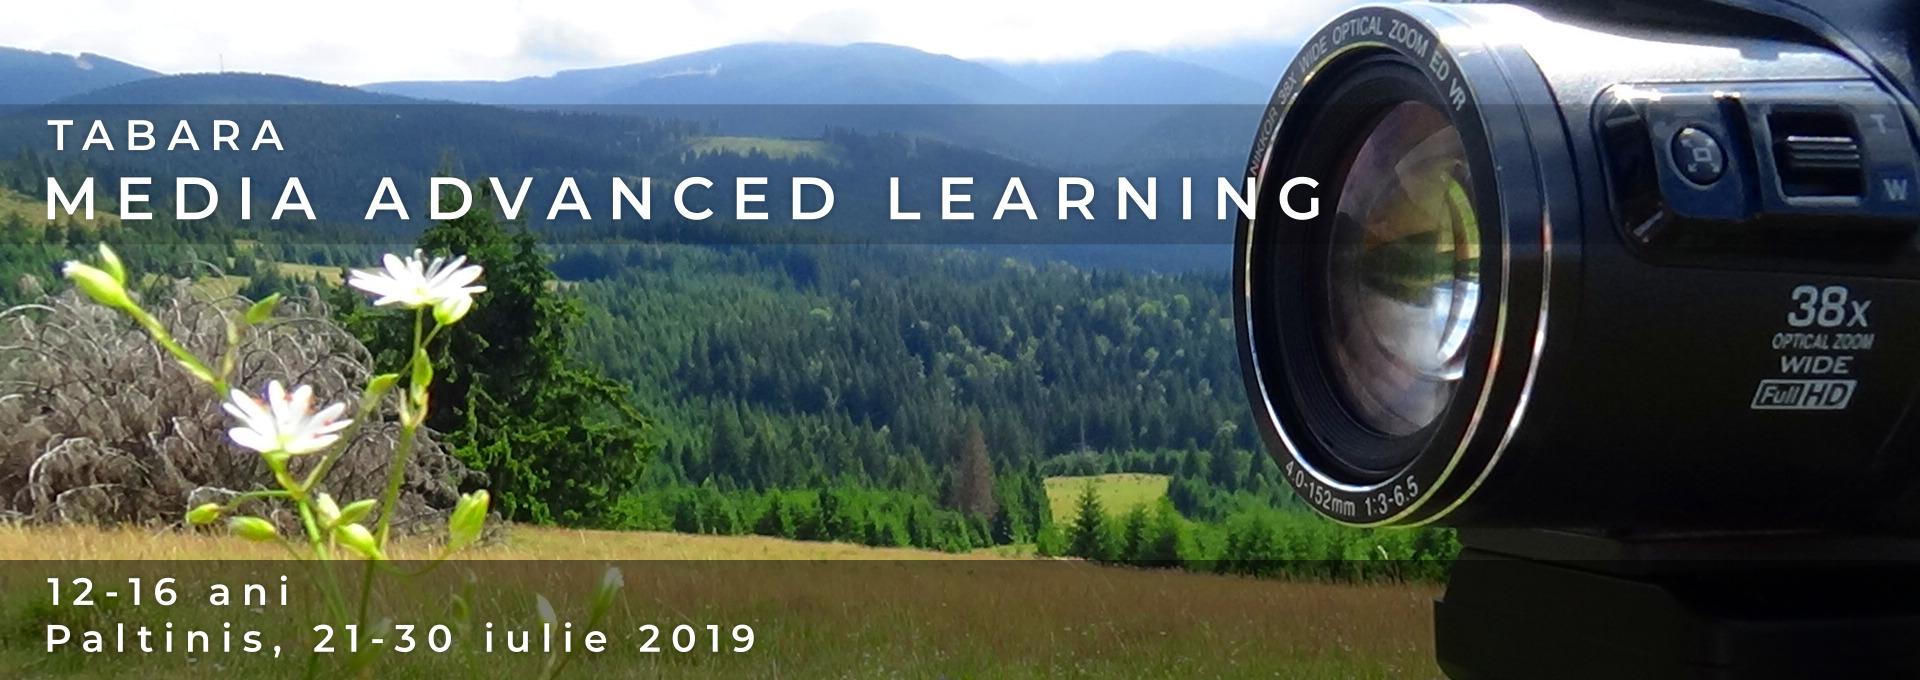 Tabara Media Advanced Learning 2019